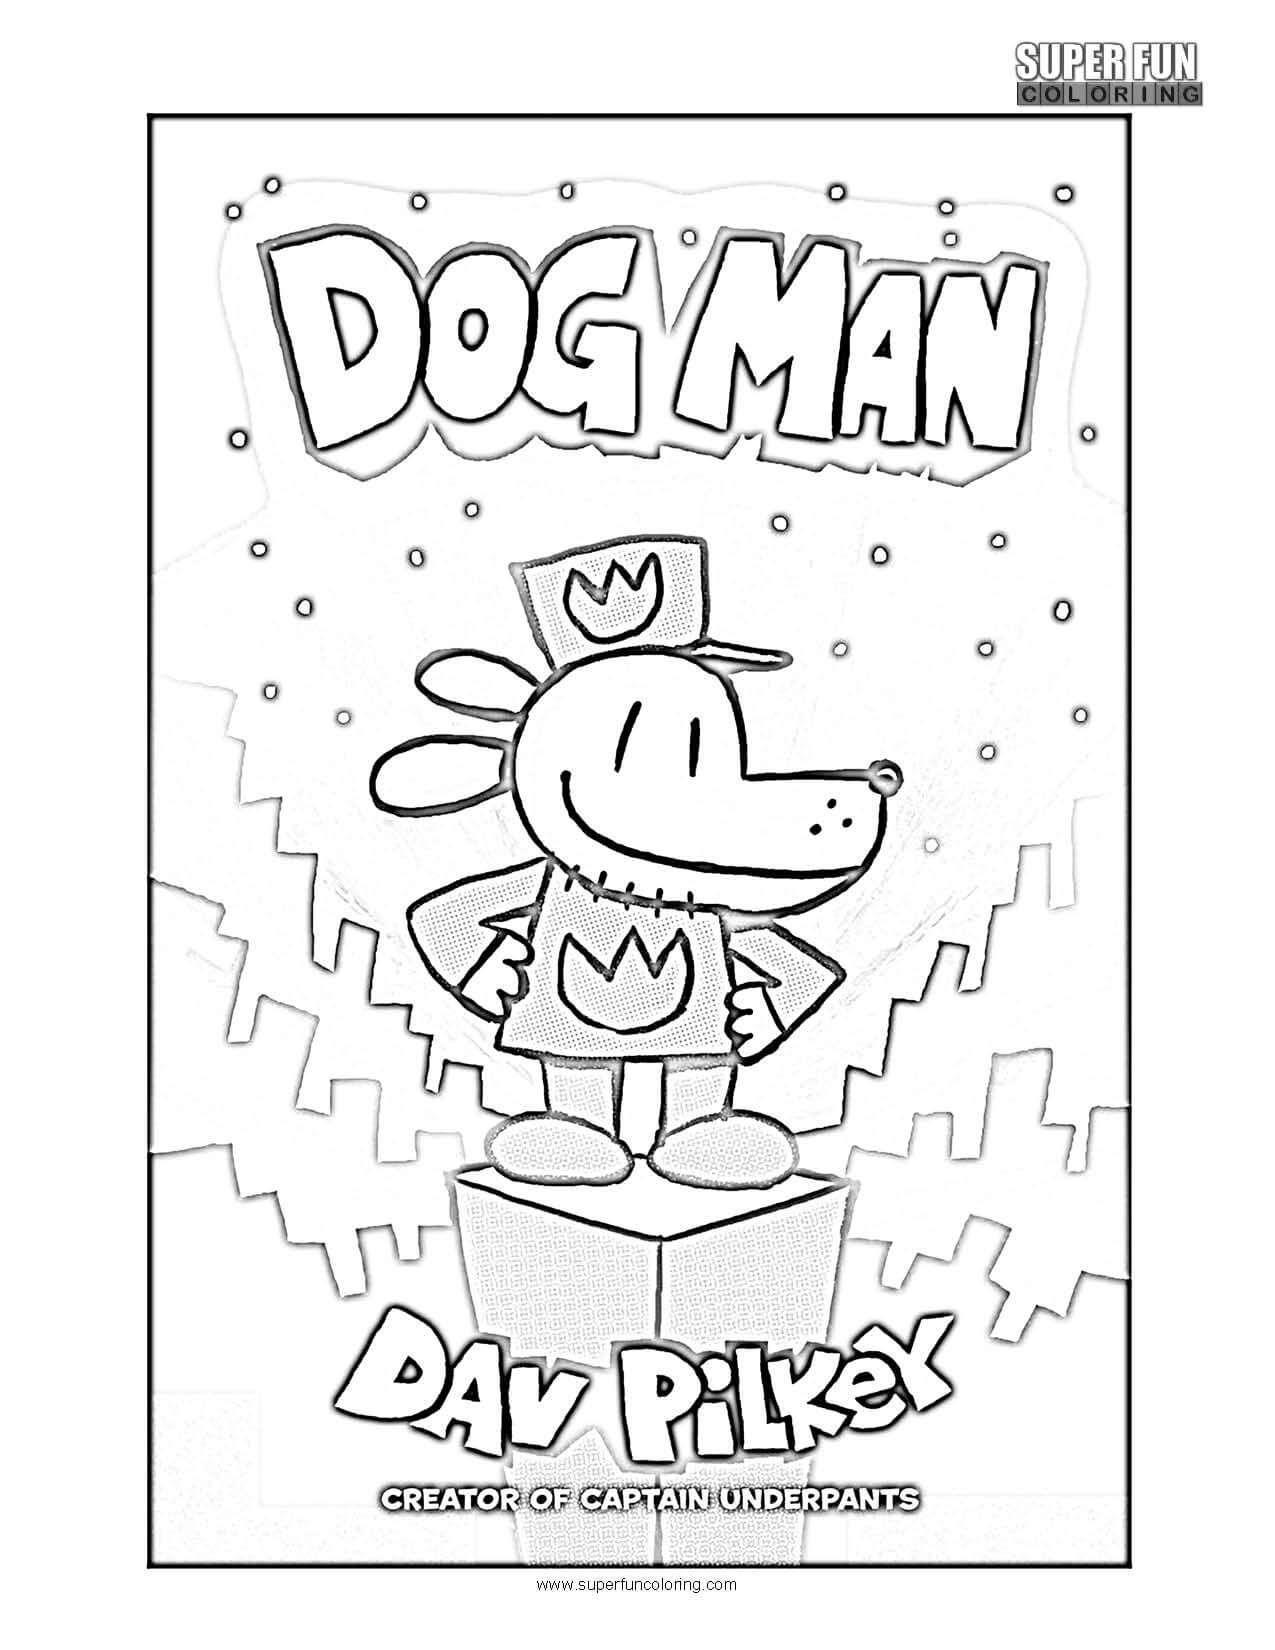 5500 Dog Man Coloring Book Hd Pokemon Coloring Pages Coloring Pages For Kids Coloring Books